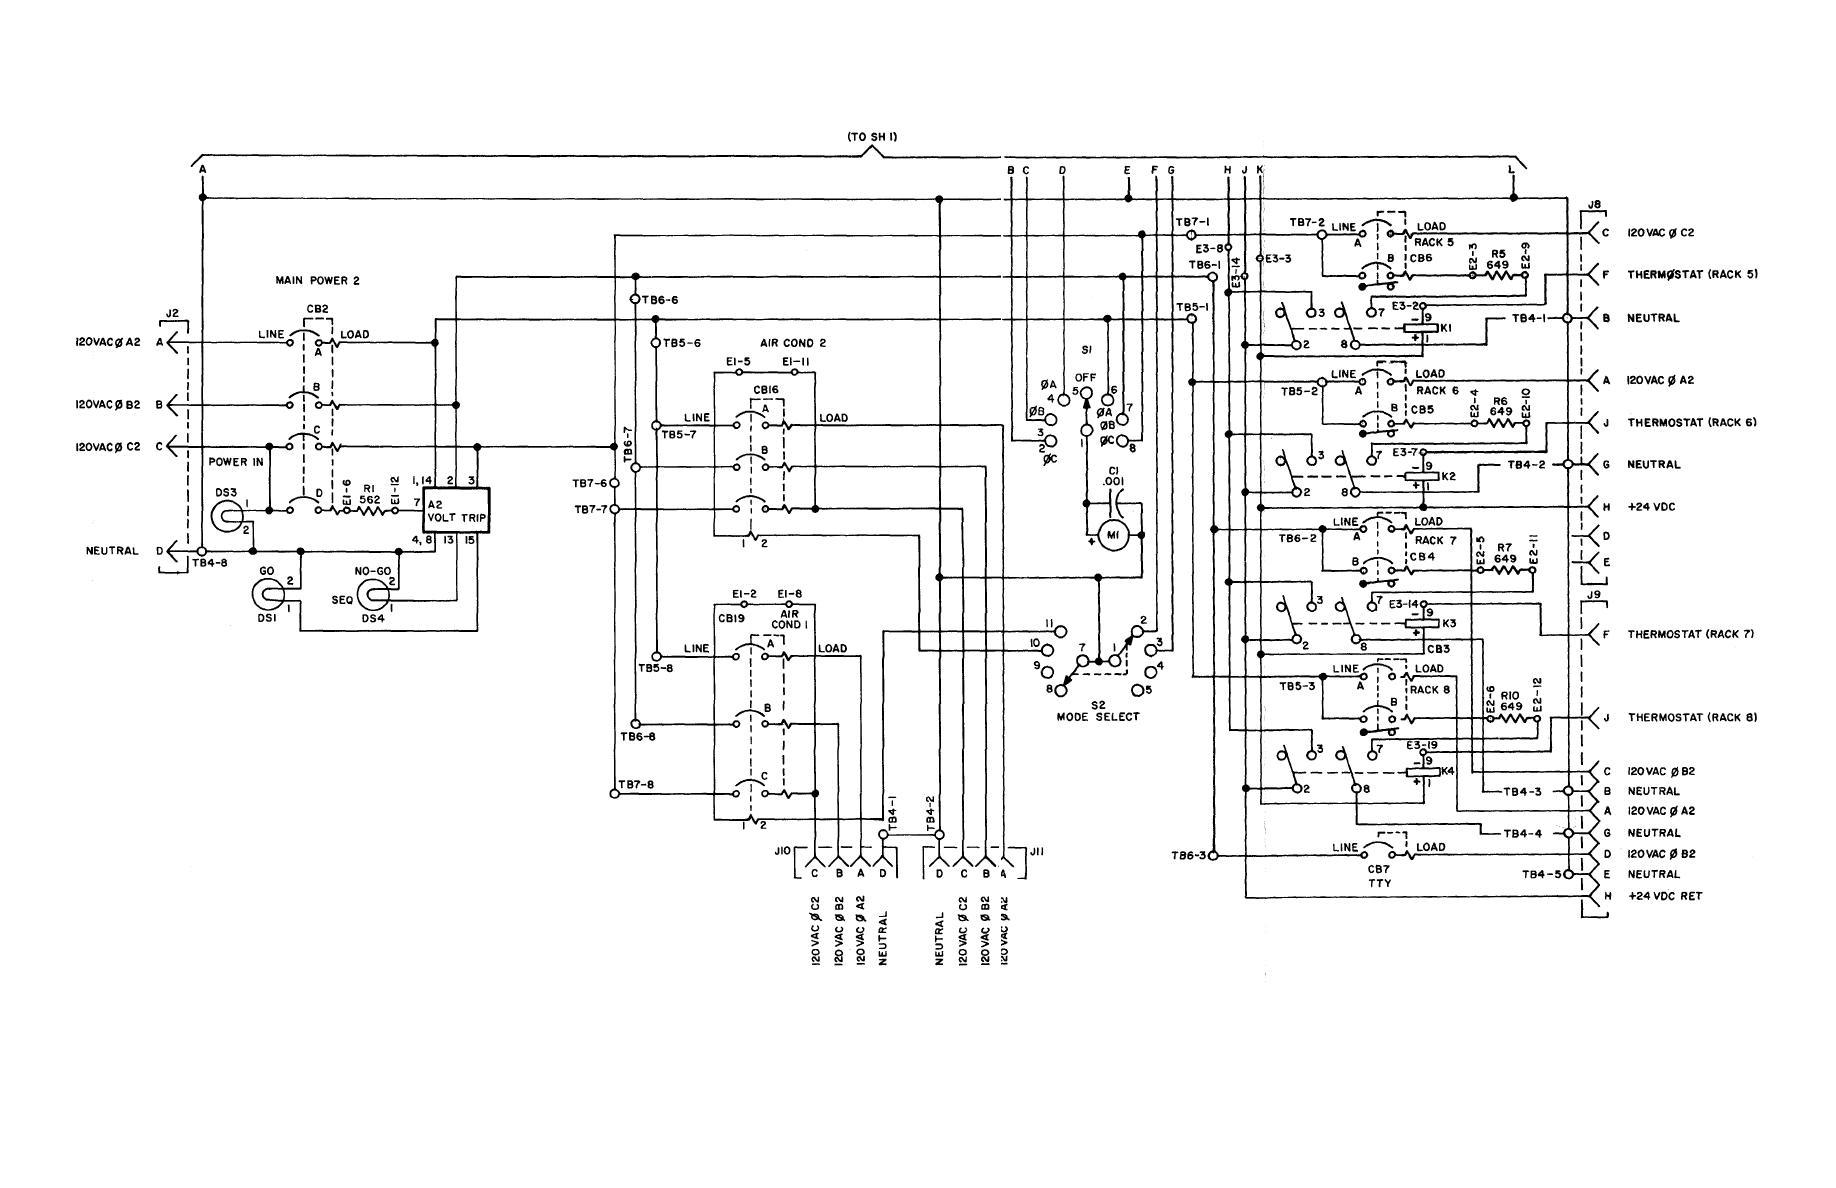 [VA_4271] Distribution Panel Wiring Diagram Download Diagram